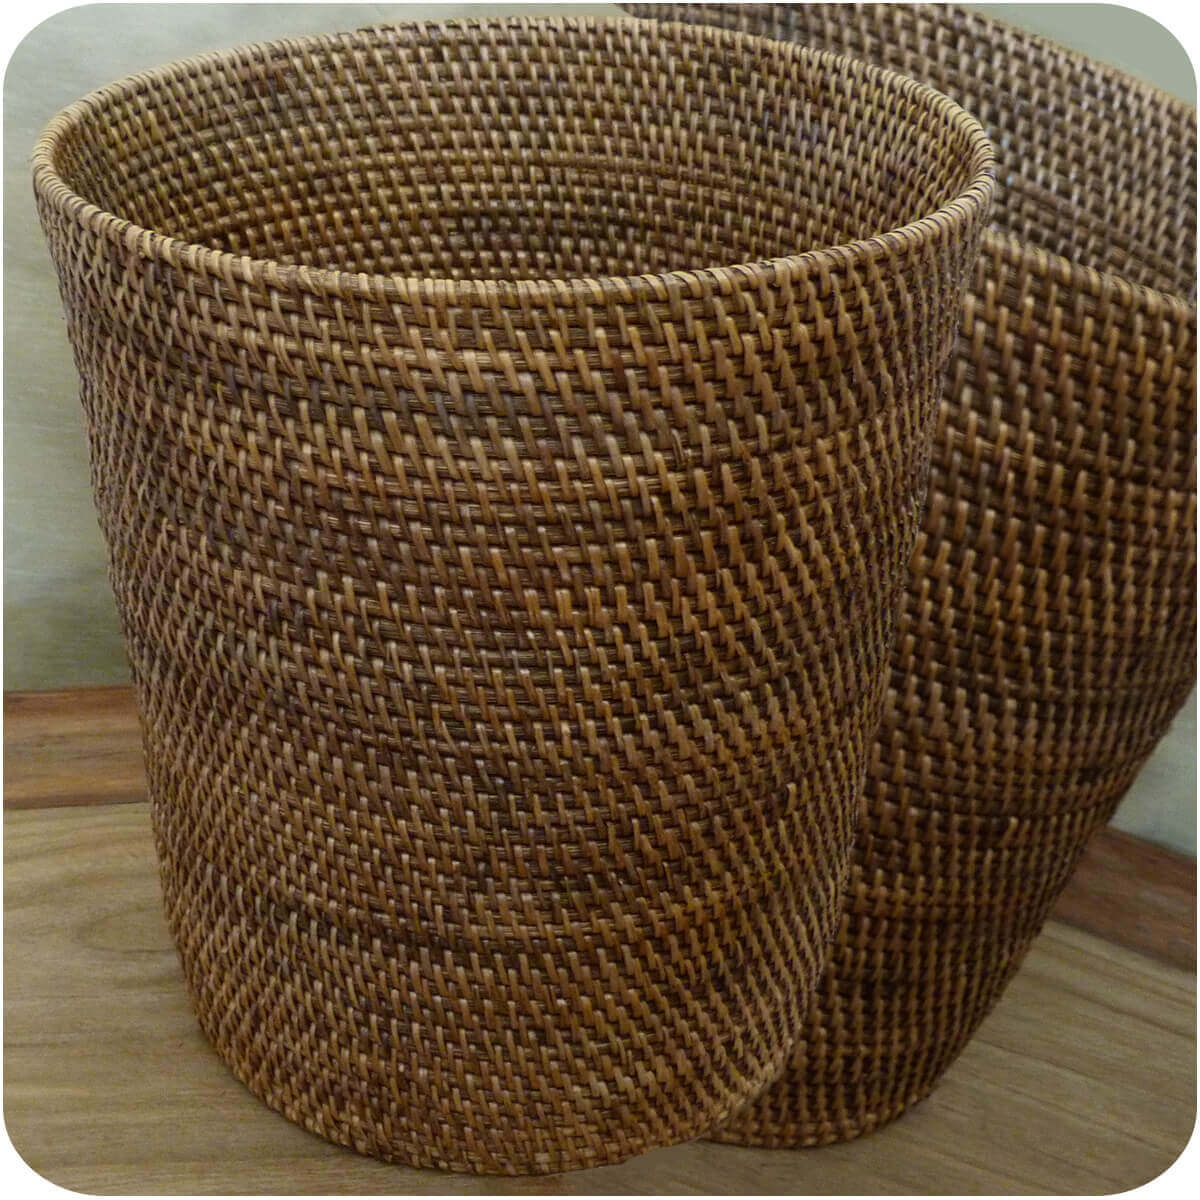 rattan papierkorb burma flechtkorb basket korb deko unikat handarbeit natur rund ebay. Black Bedroom Furniture Sets. Home Design Ideas